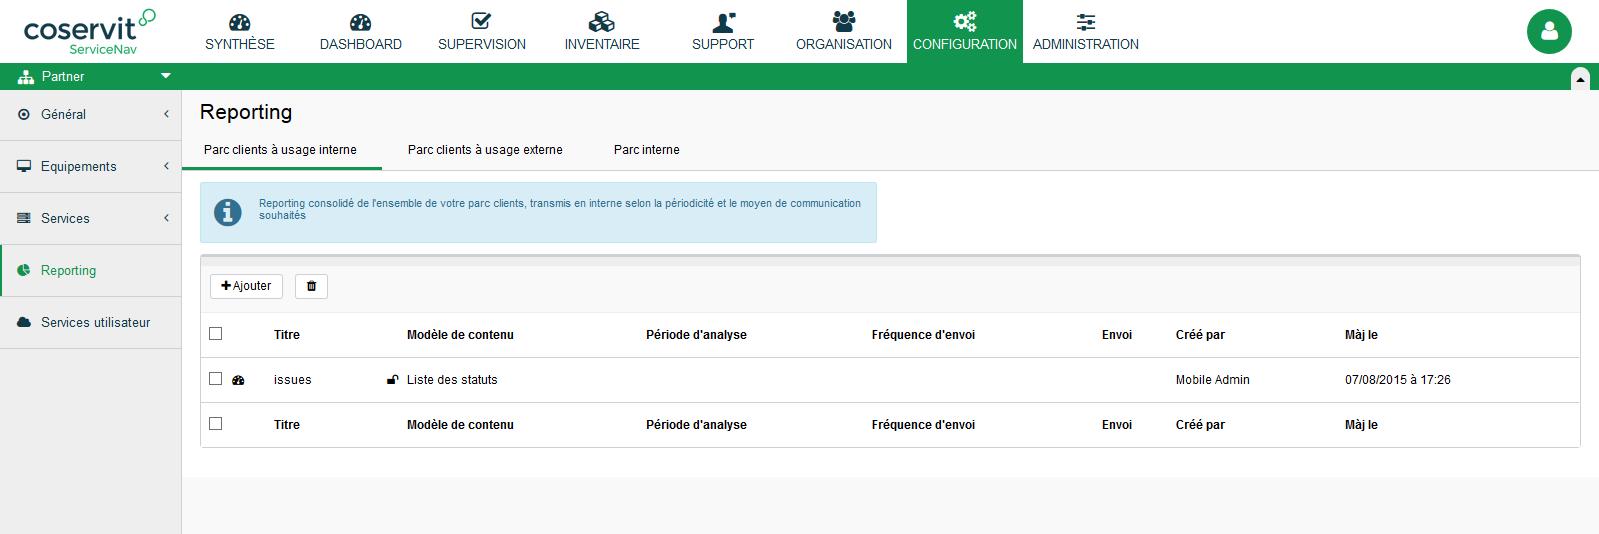 Configuration - Reporting - Dashboard - Liste - parc client